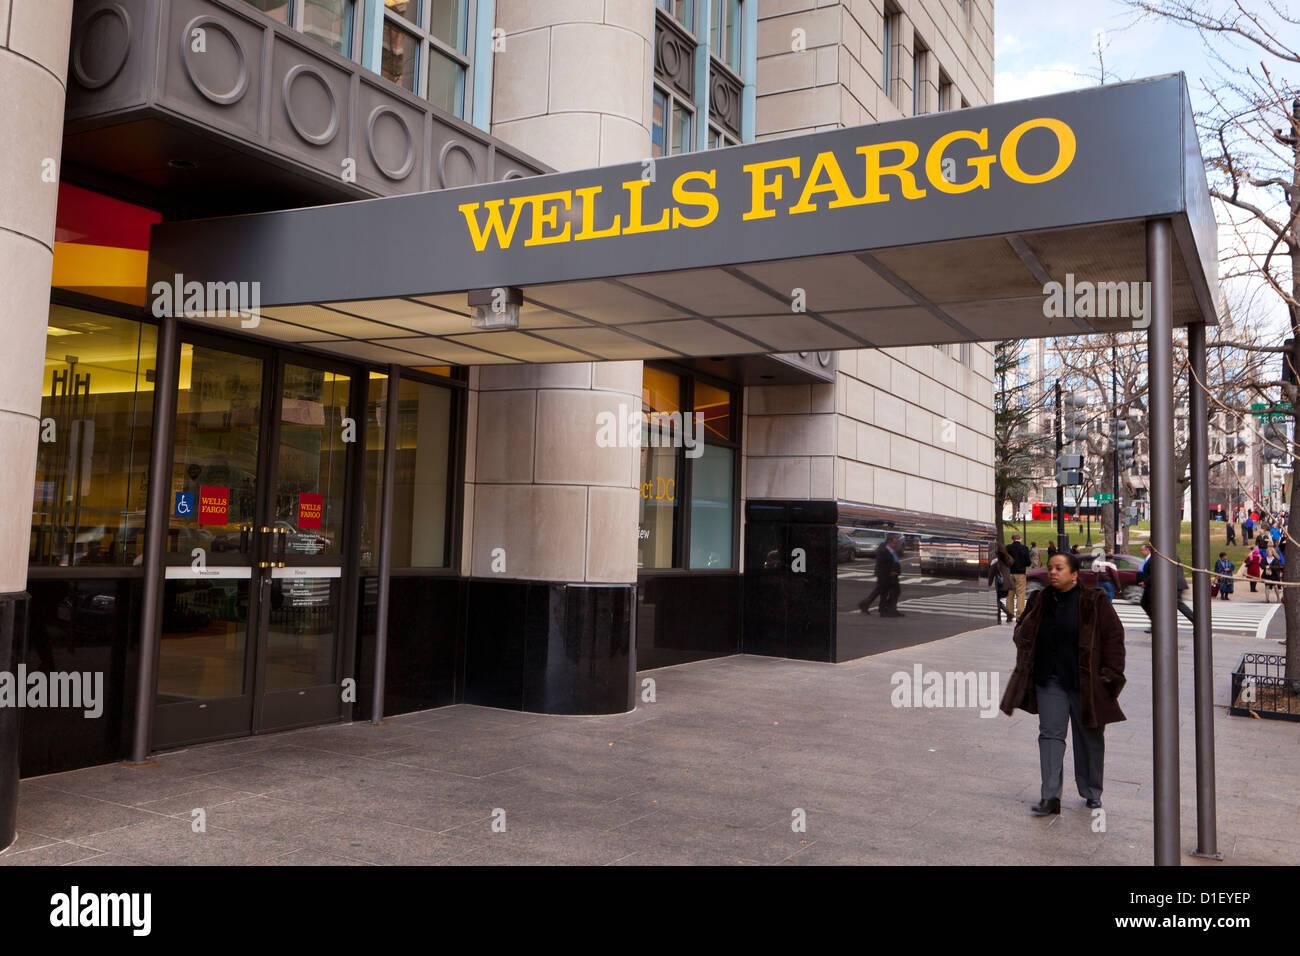 Wells Fargo Zweig Eingang - Washington, DC, USA Stockbild